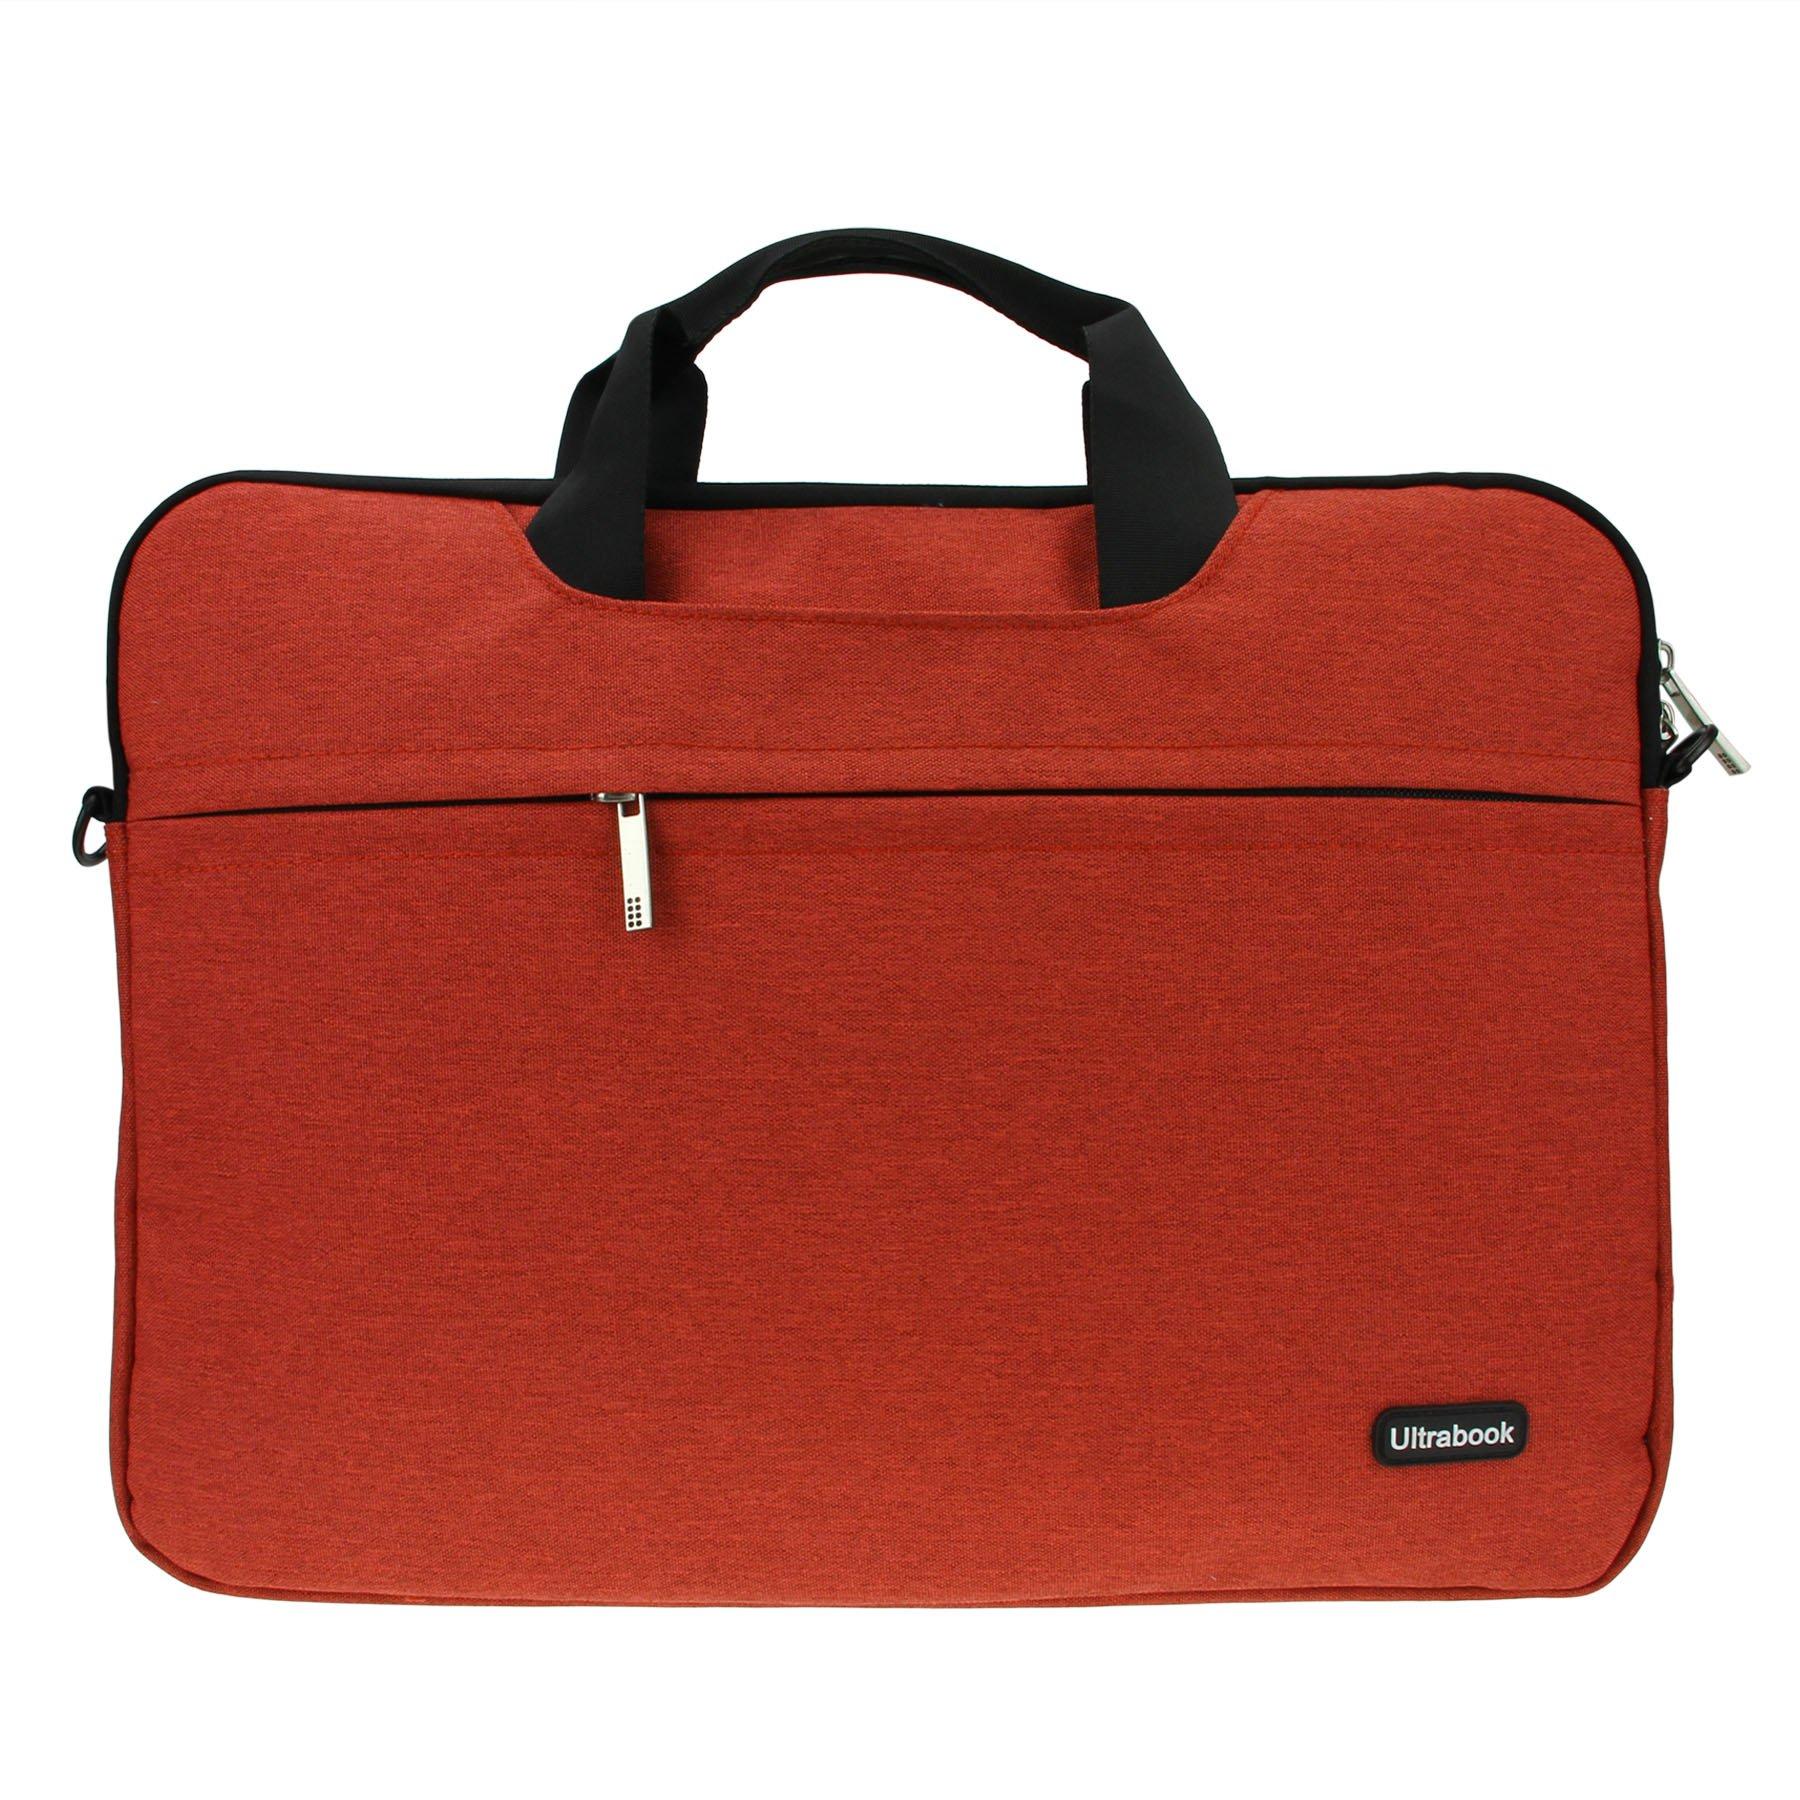 Slim Compact Lightweight 15 inch Adjustable Strap Computer Laptop/Notebook/Tablet/MacBook/iPad Handbag Messenger Shoulder Bag Business Briefcase Travel School Carrying Sleeve Case Tote (Orange 15'')